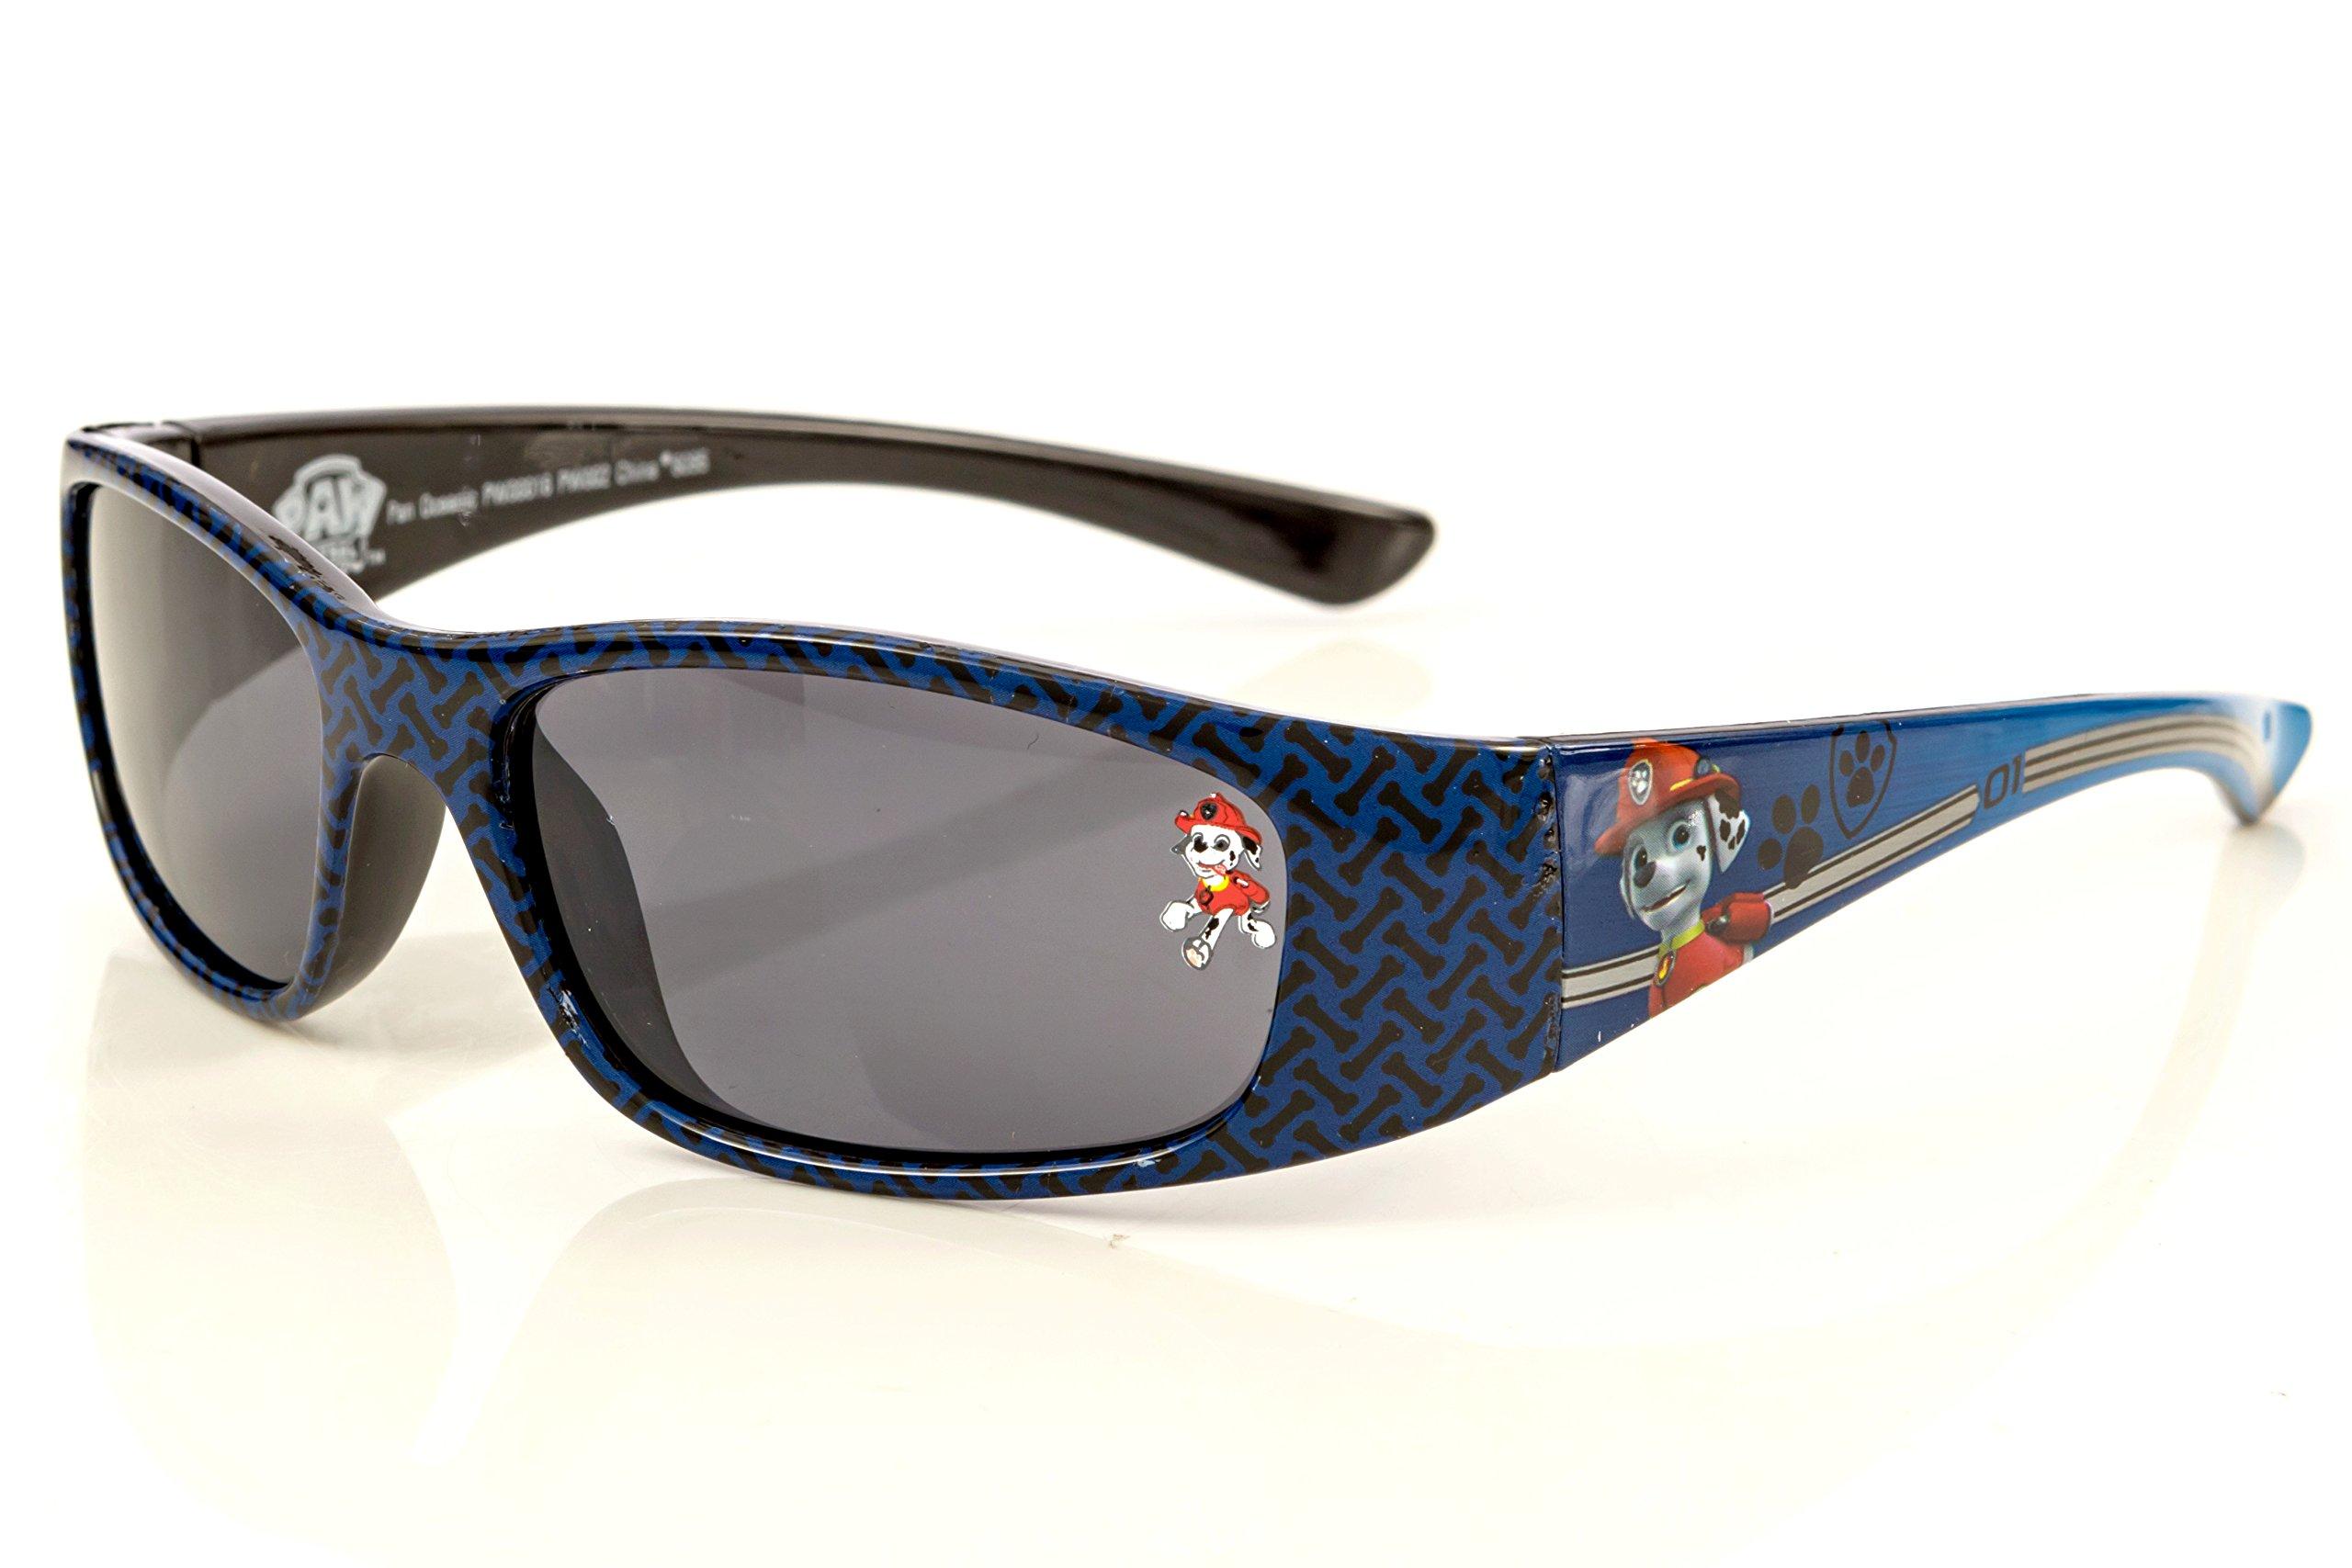 Nickelodeon Boys Paw Patrol Blue Tread Sunglasses - 100% UVA & UVB Protection